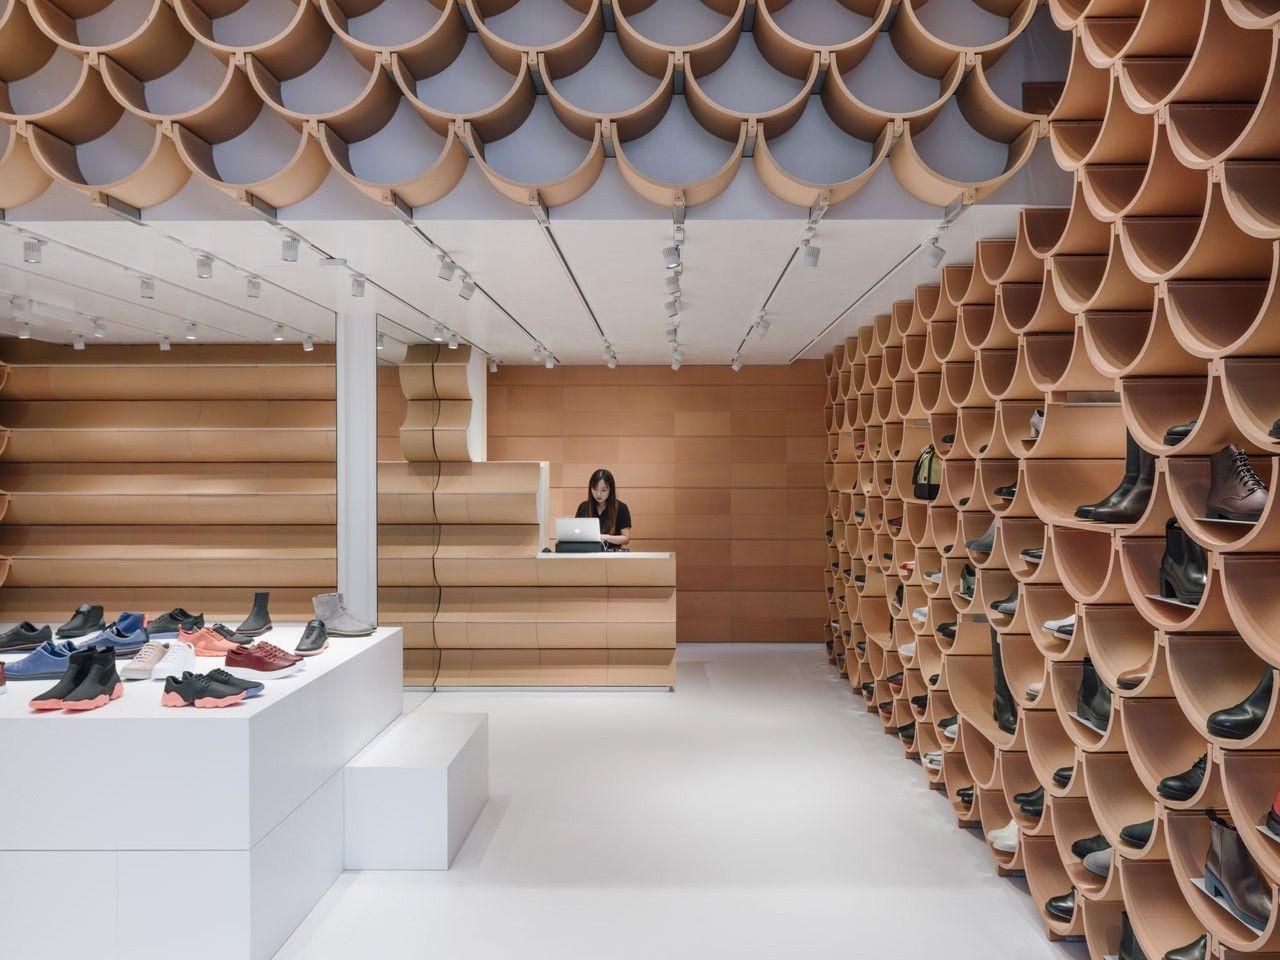 Roof tiles shoe displays in Camper store by Kengo